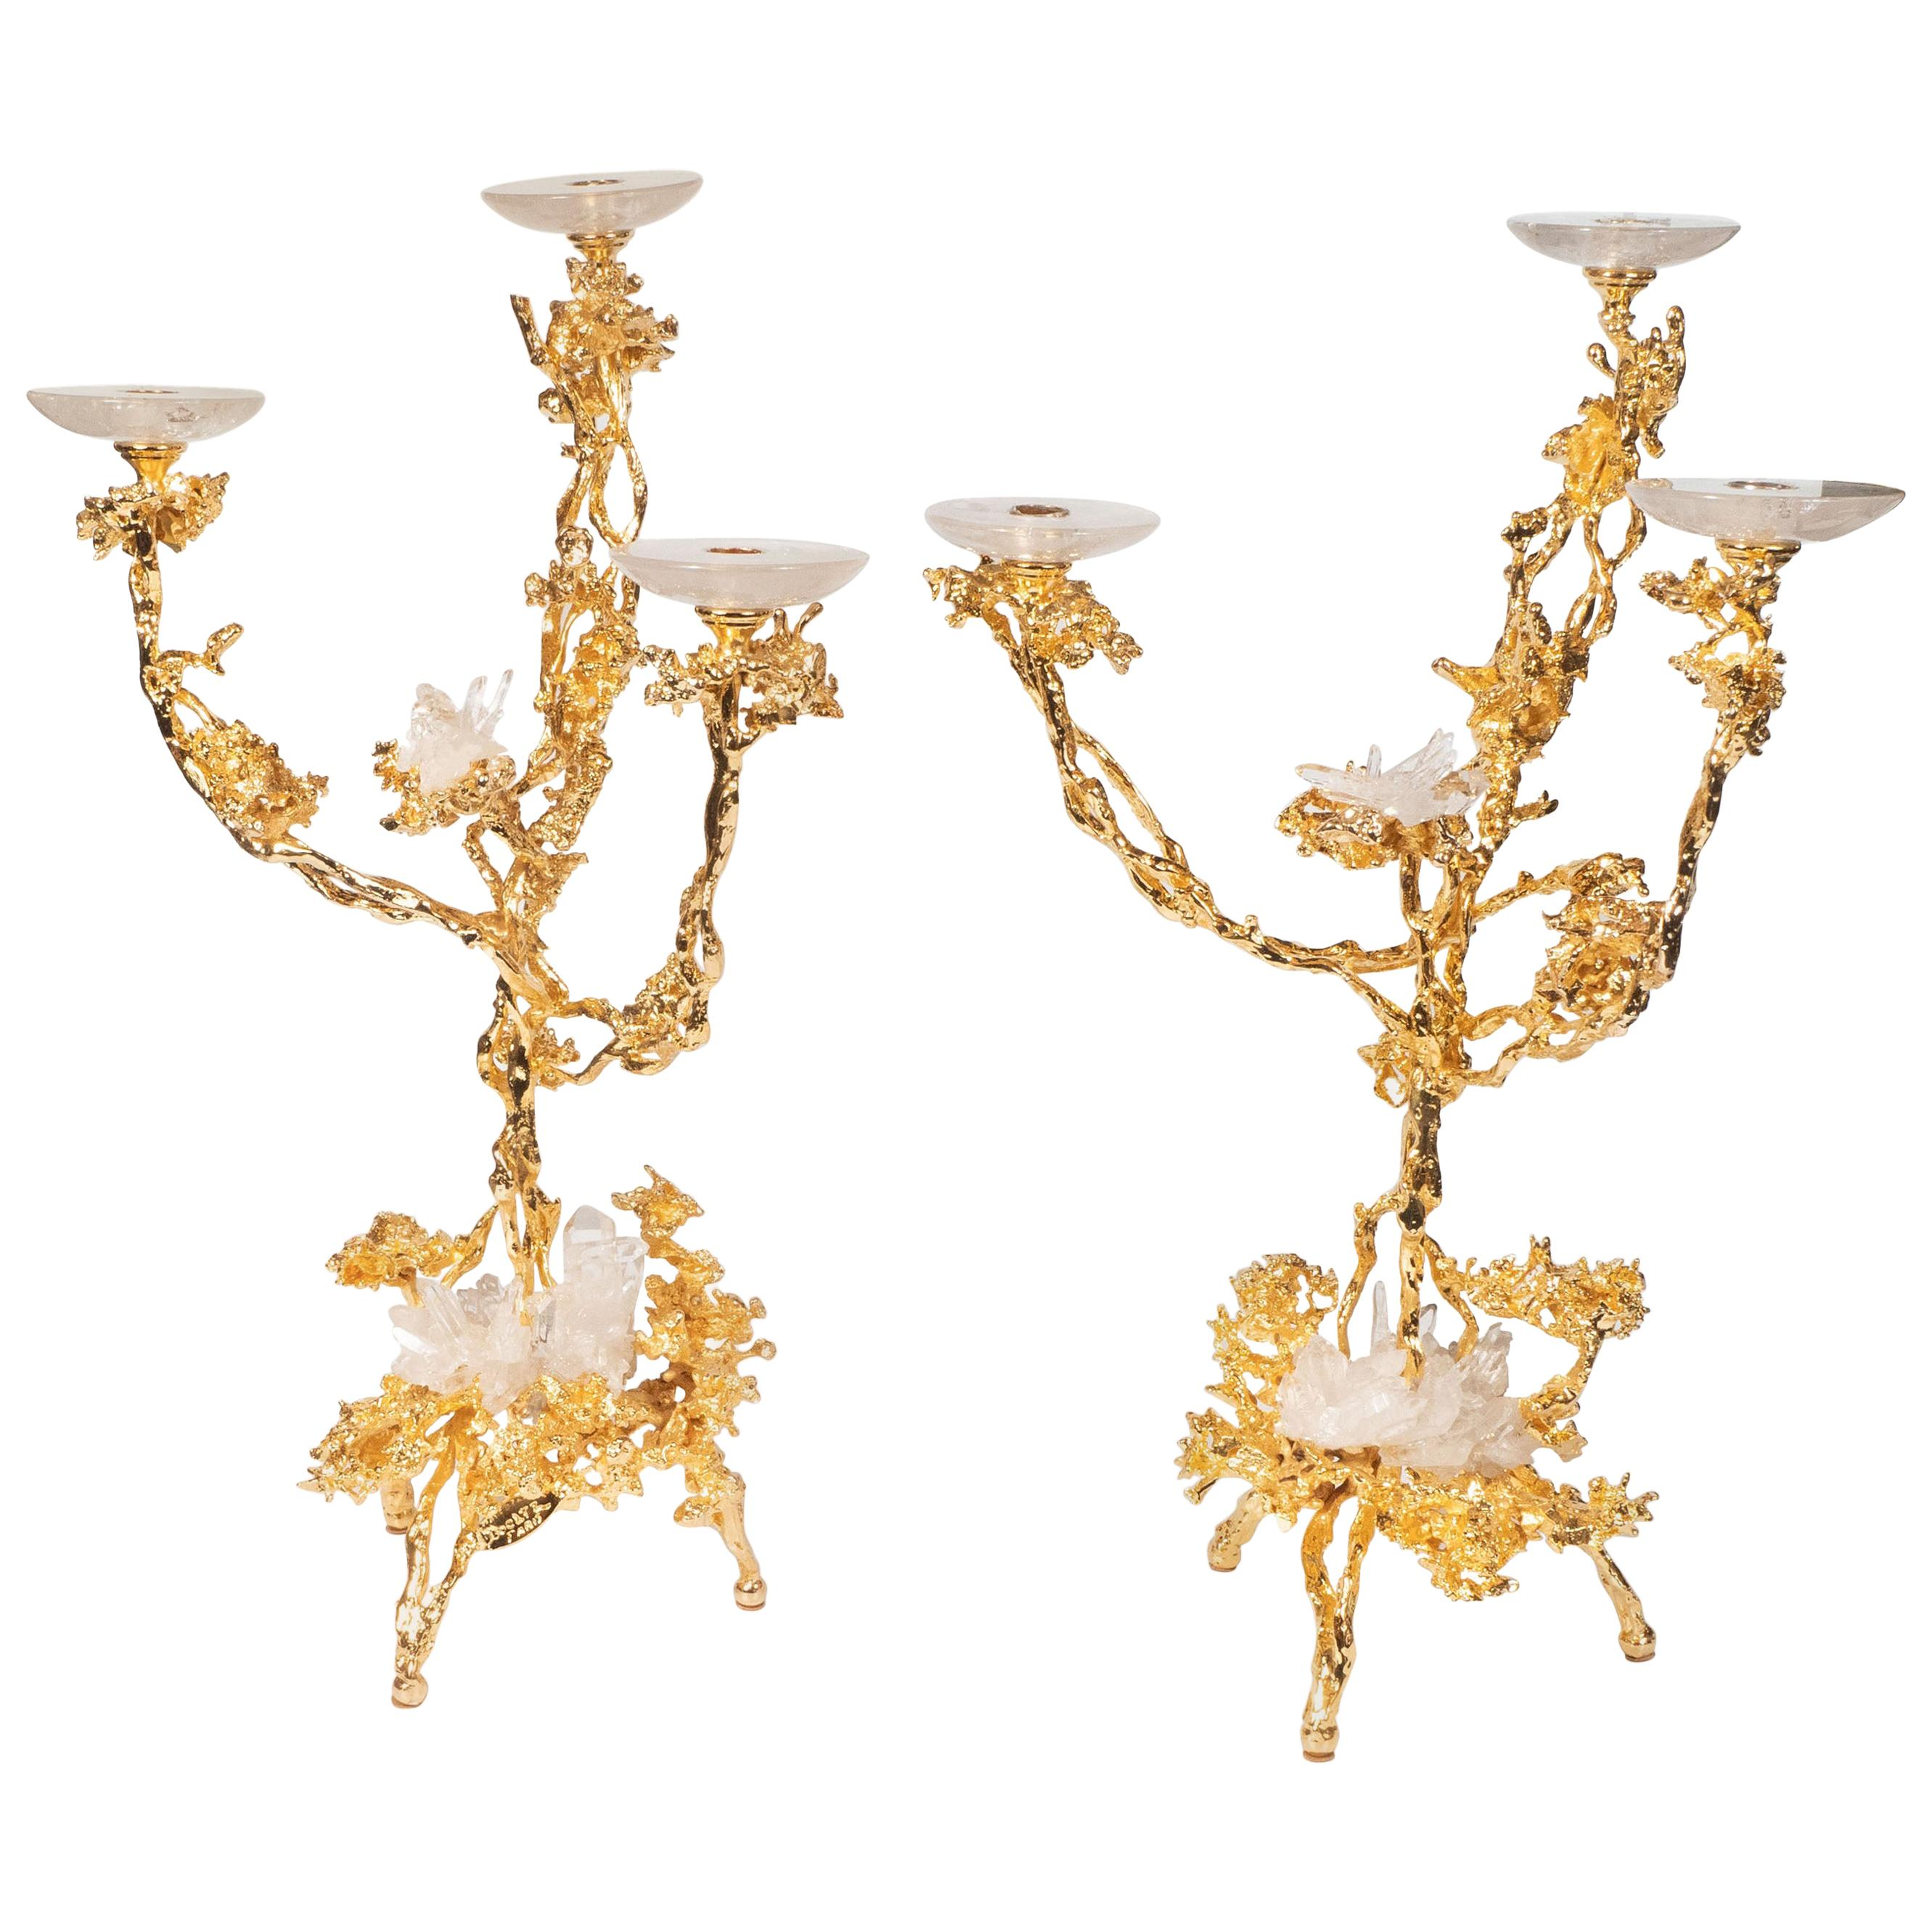 24-Karat Gold Triple Branch Candlesticks with Rock Crystals, Claude Boeltz, Pair